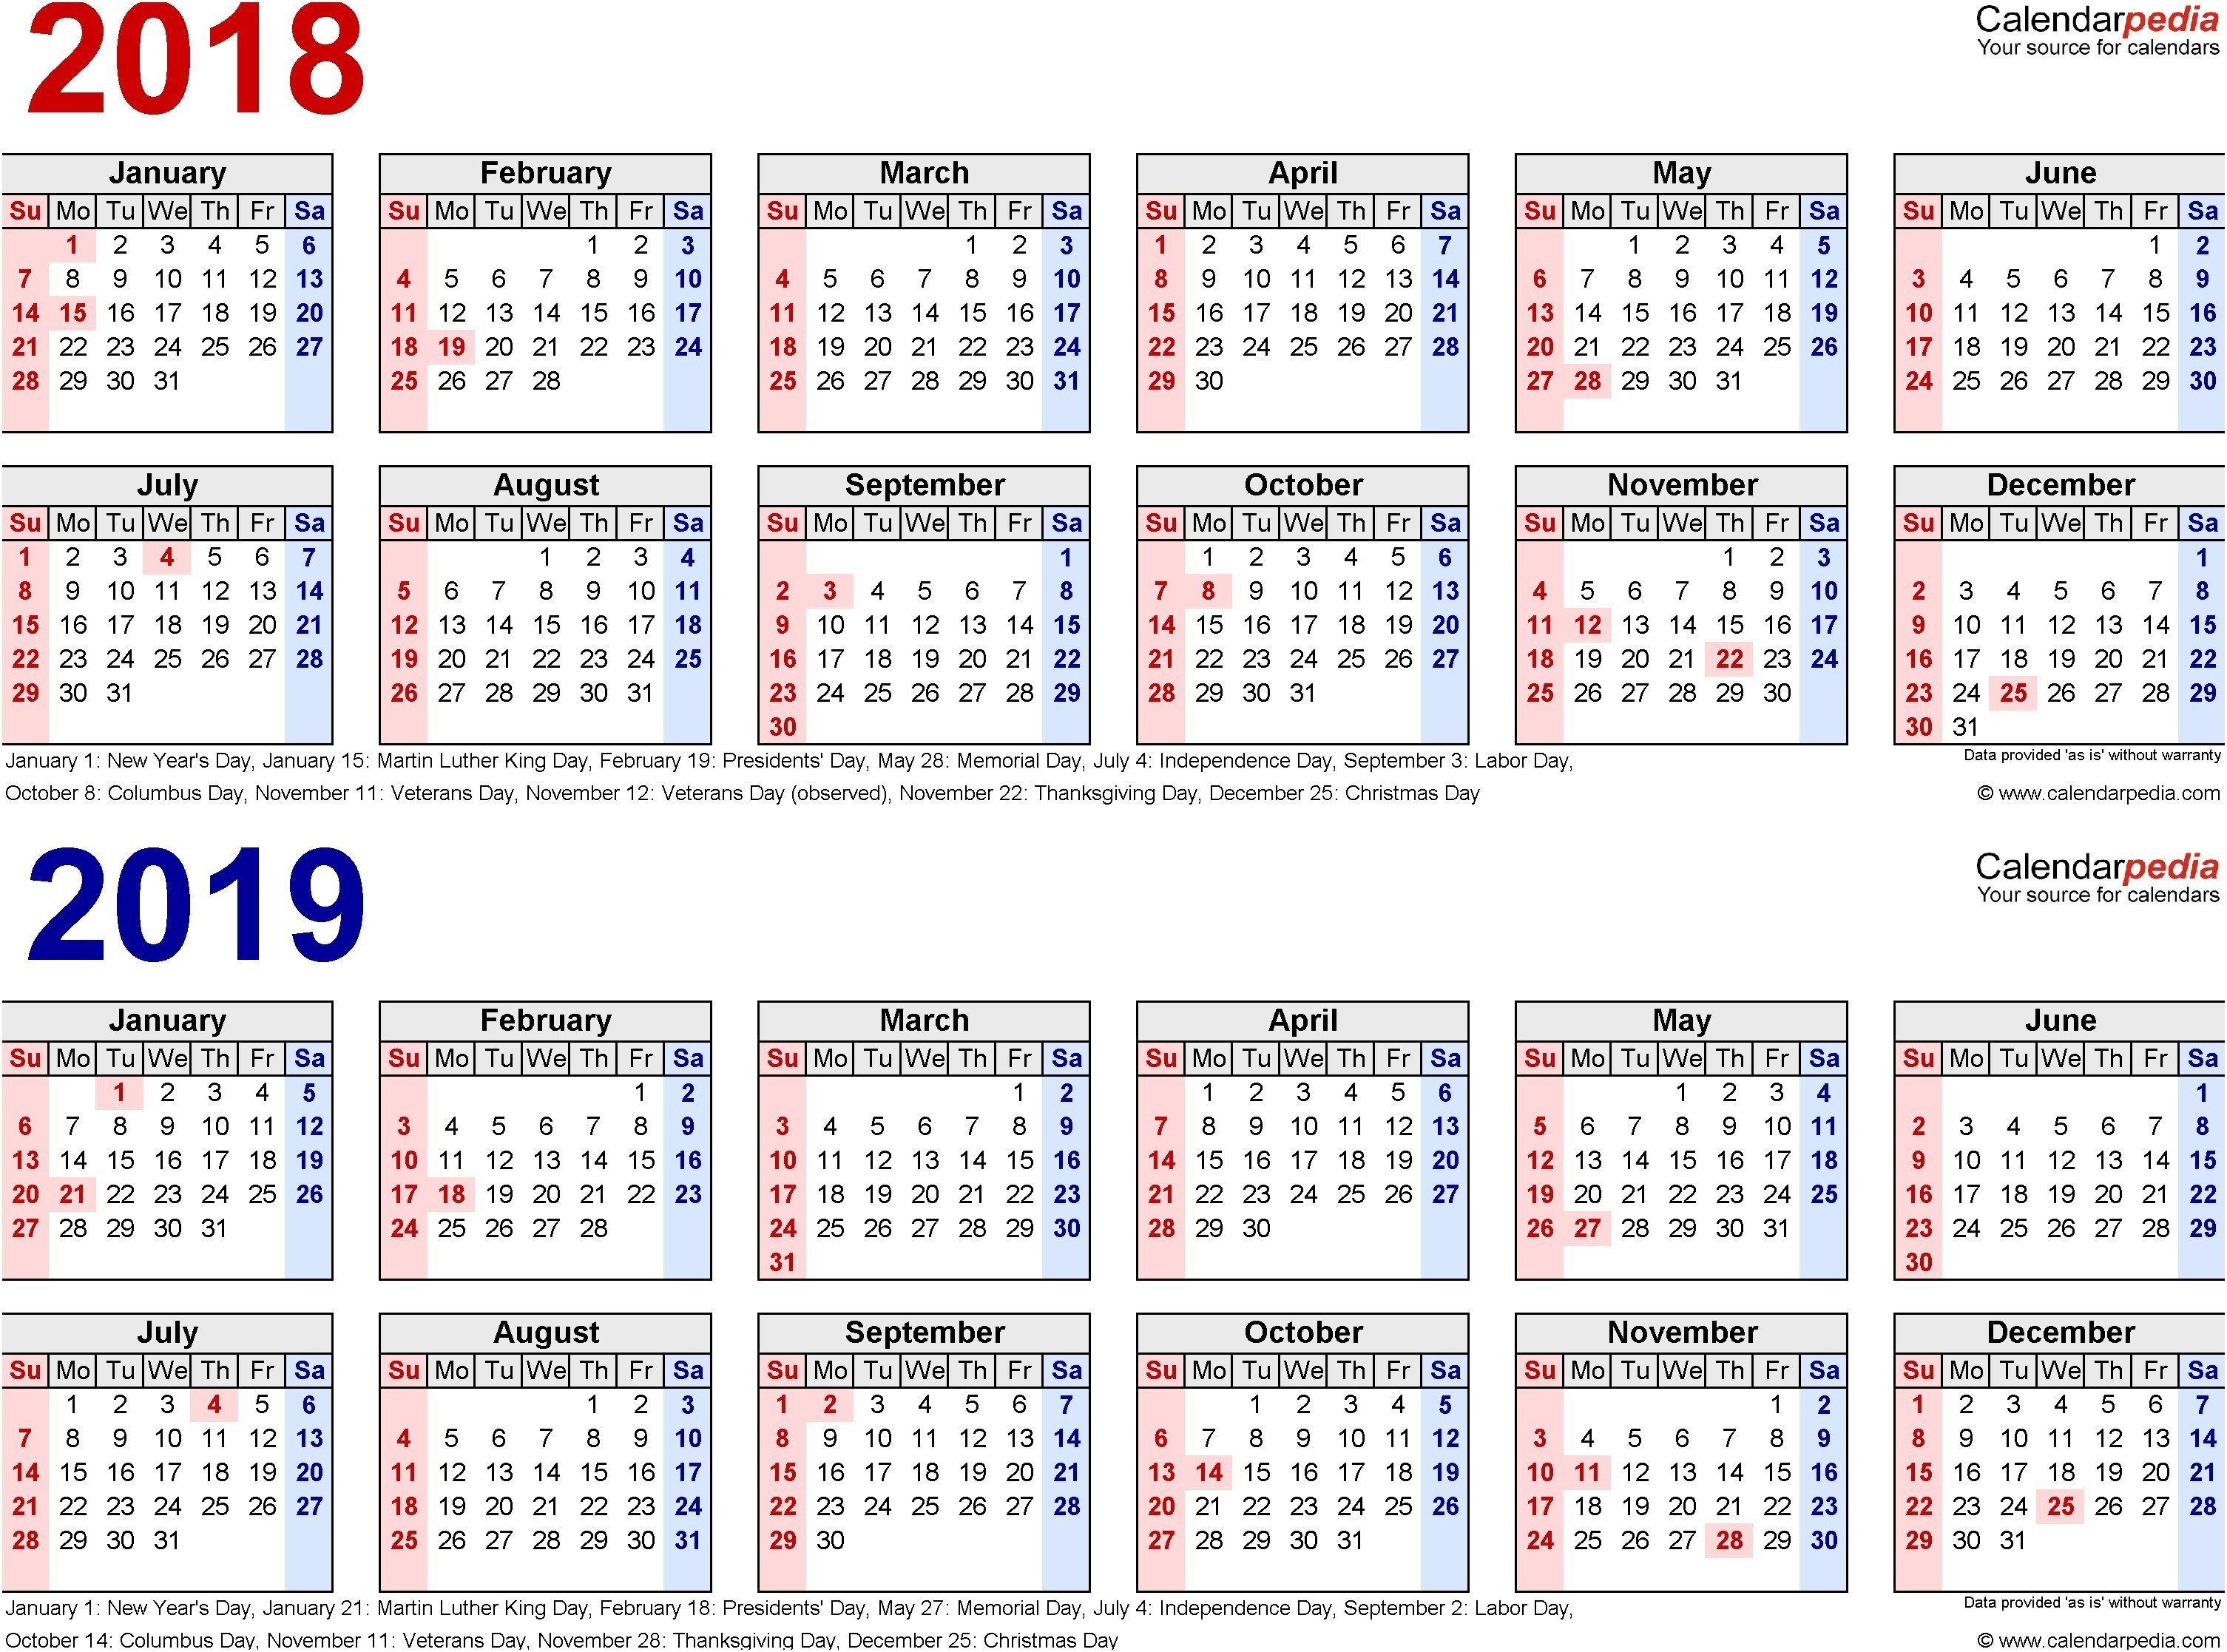 2019 Calendar 20 13 Period Calendar - Calendar 2019 Calendar 4-4-5